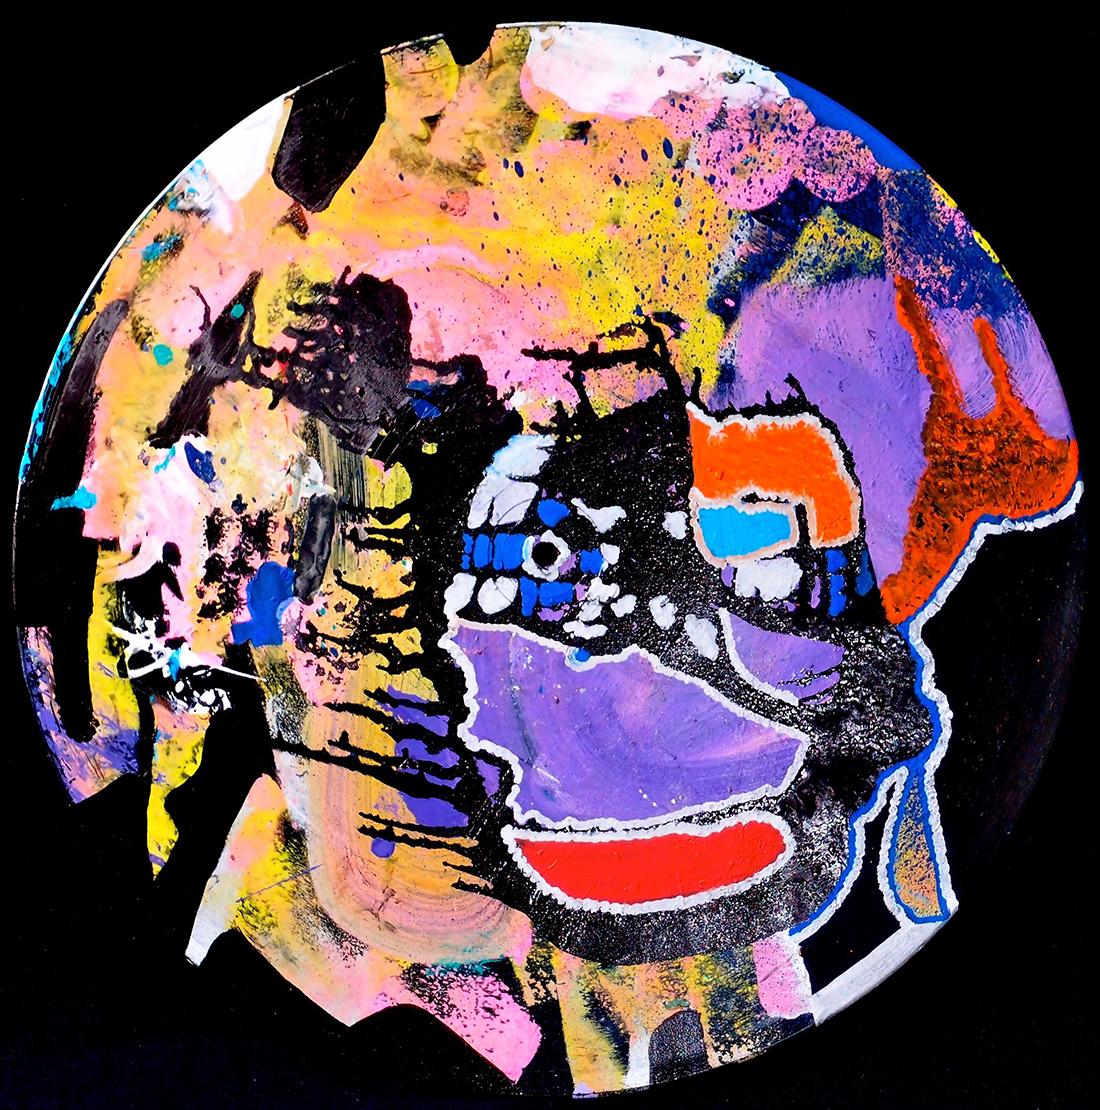 Outer space IV - 33x33cm Graffiti art painting - Dimension Fantasmic